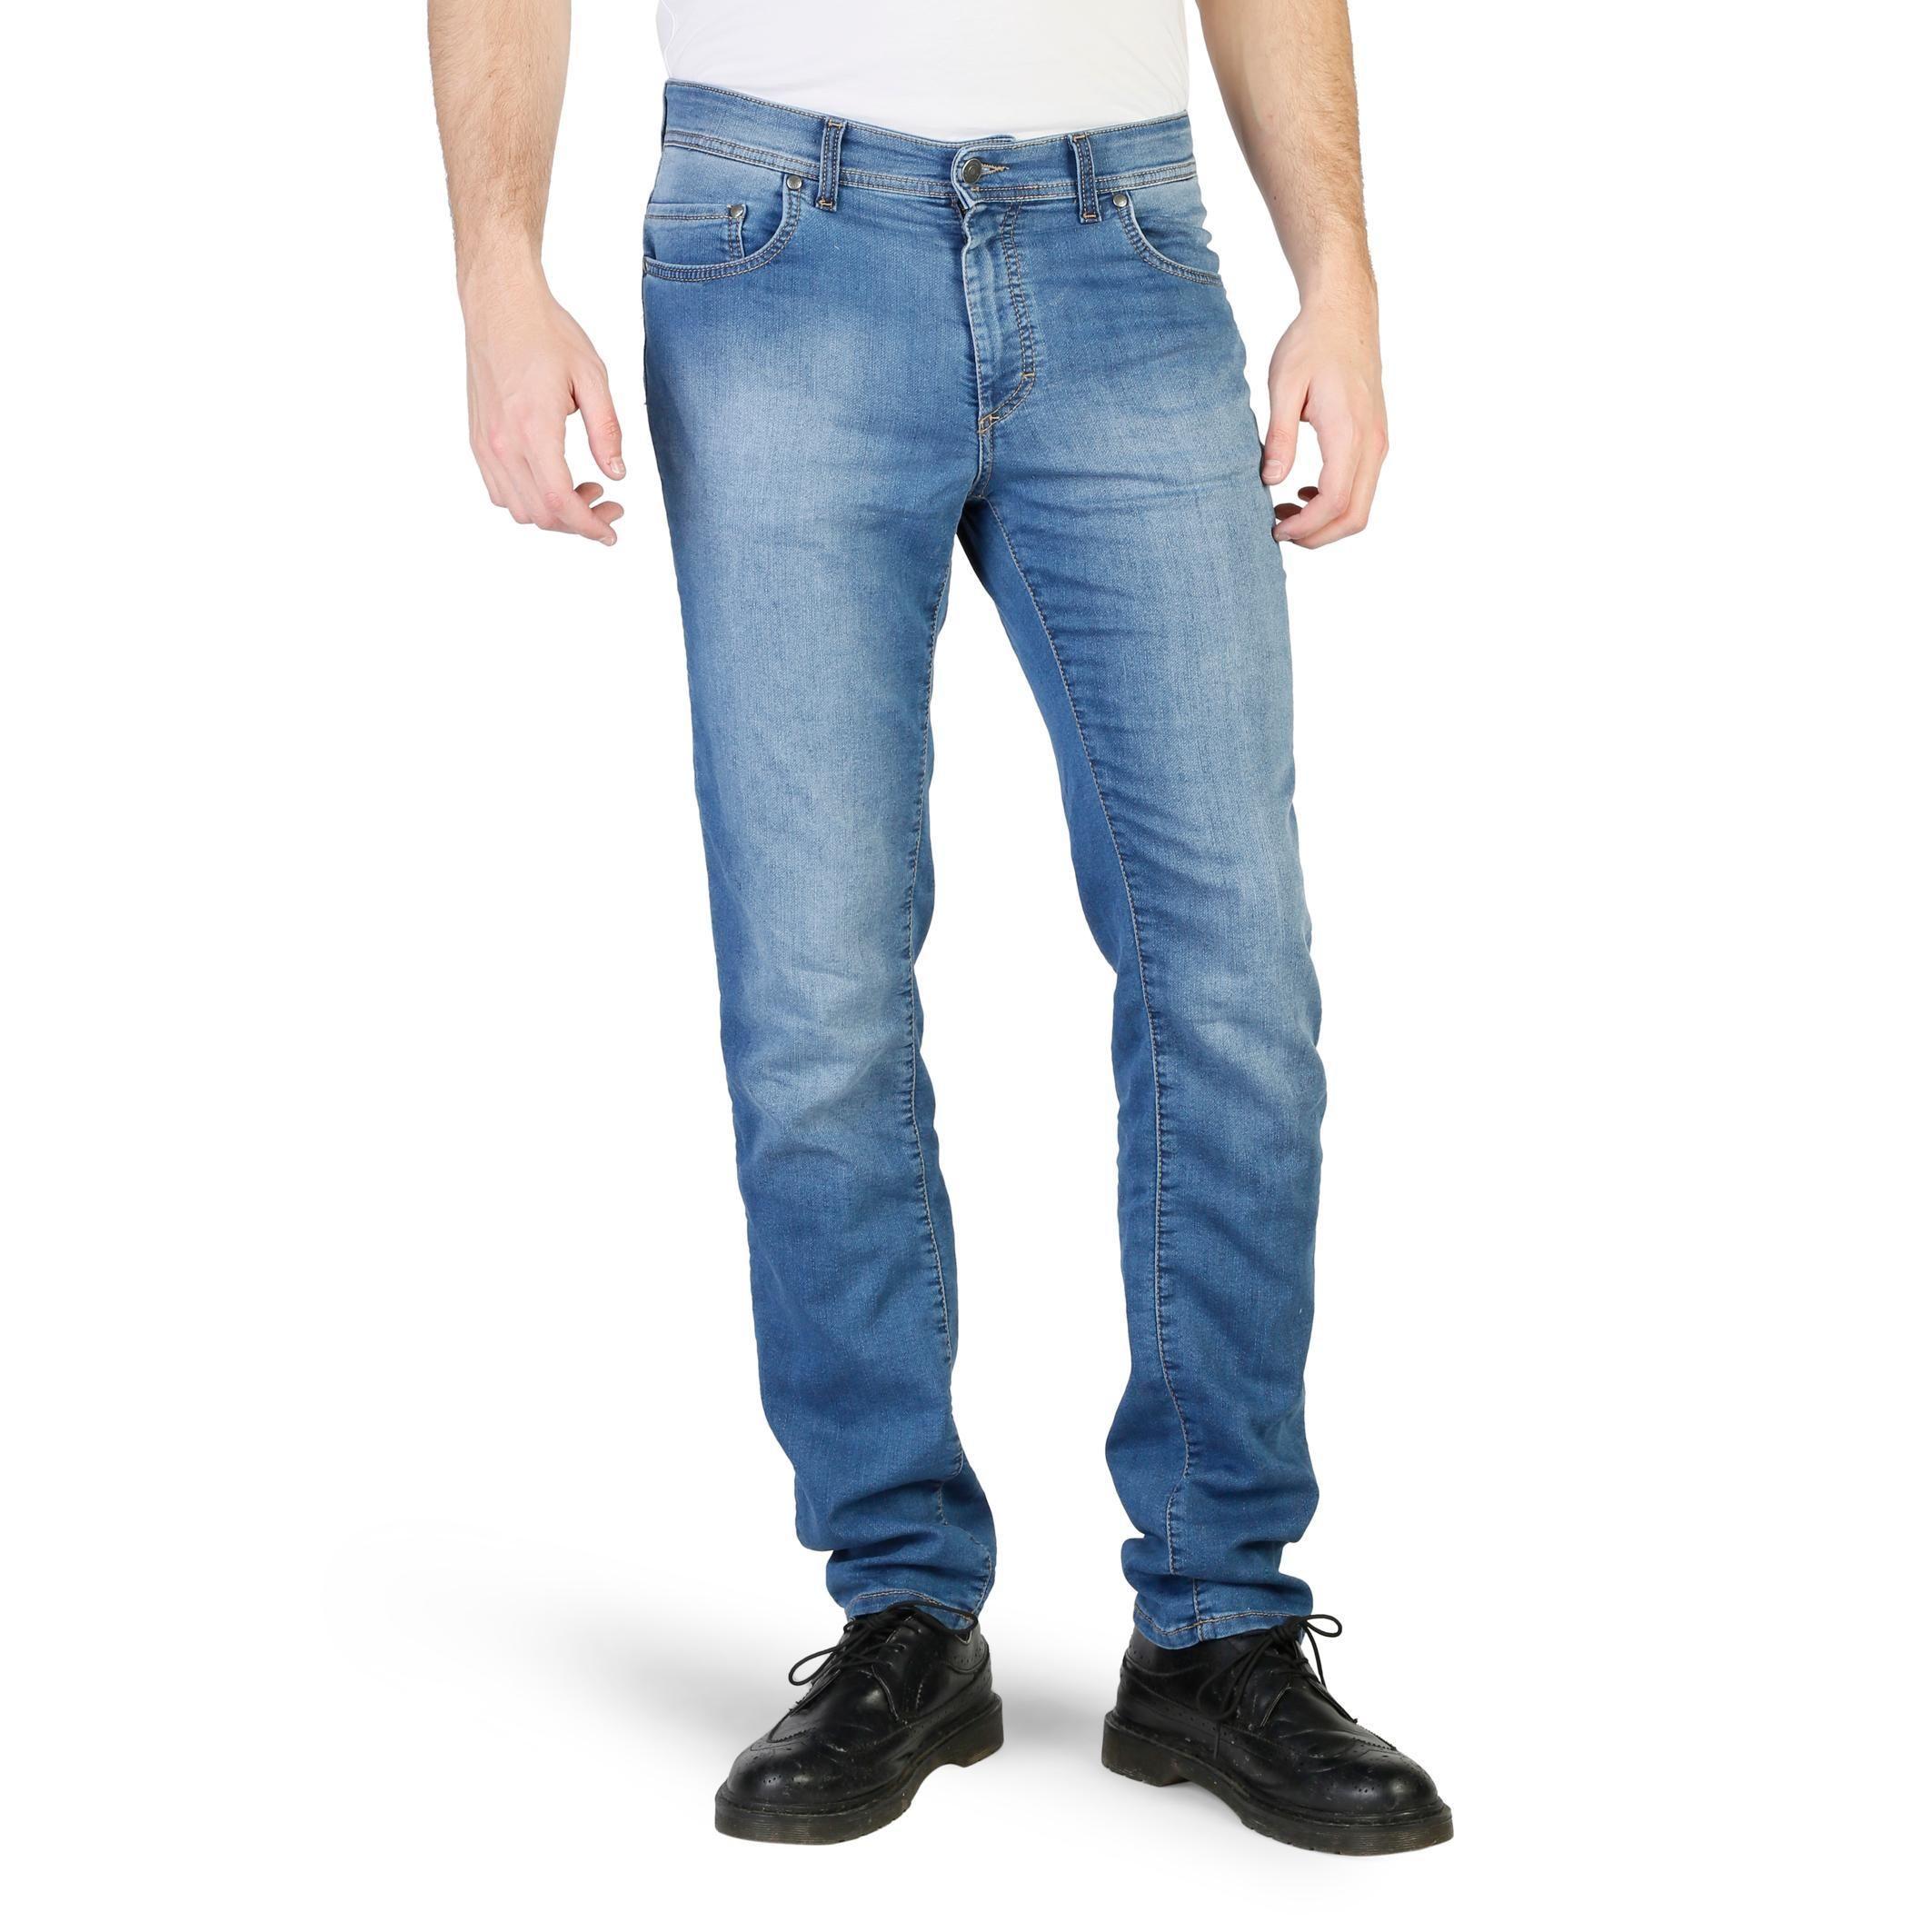 b7645e6be47 Carrera Jeans - 00700R 0900A